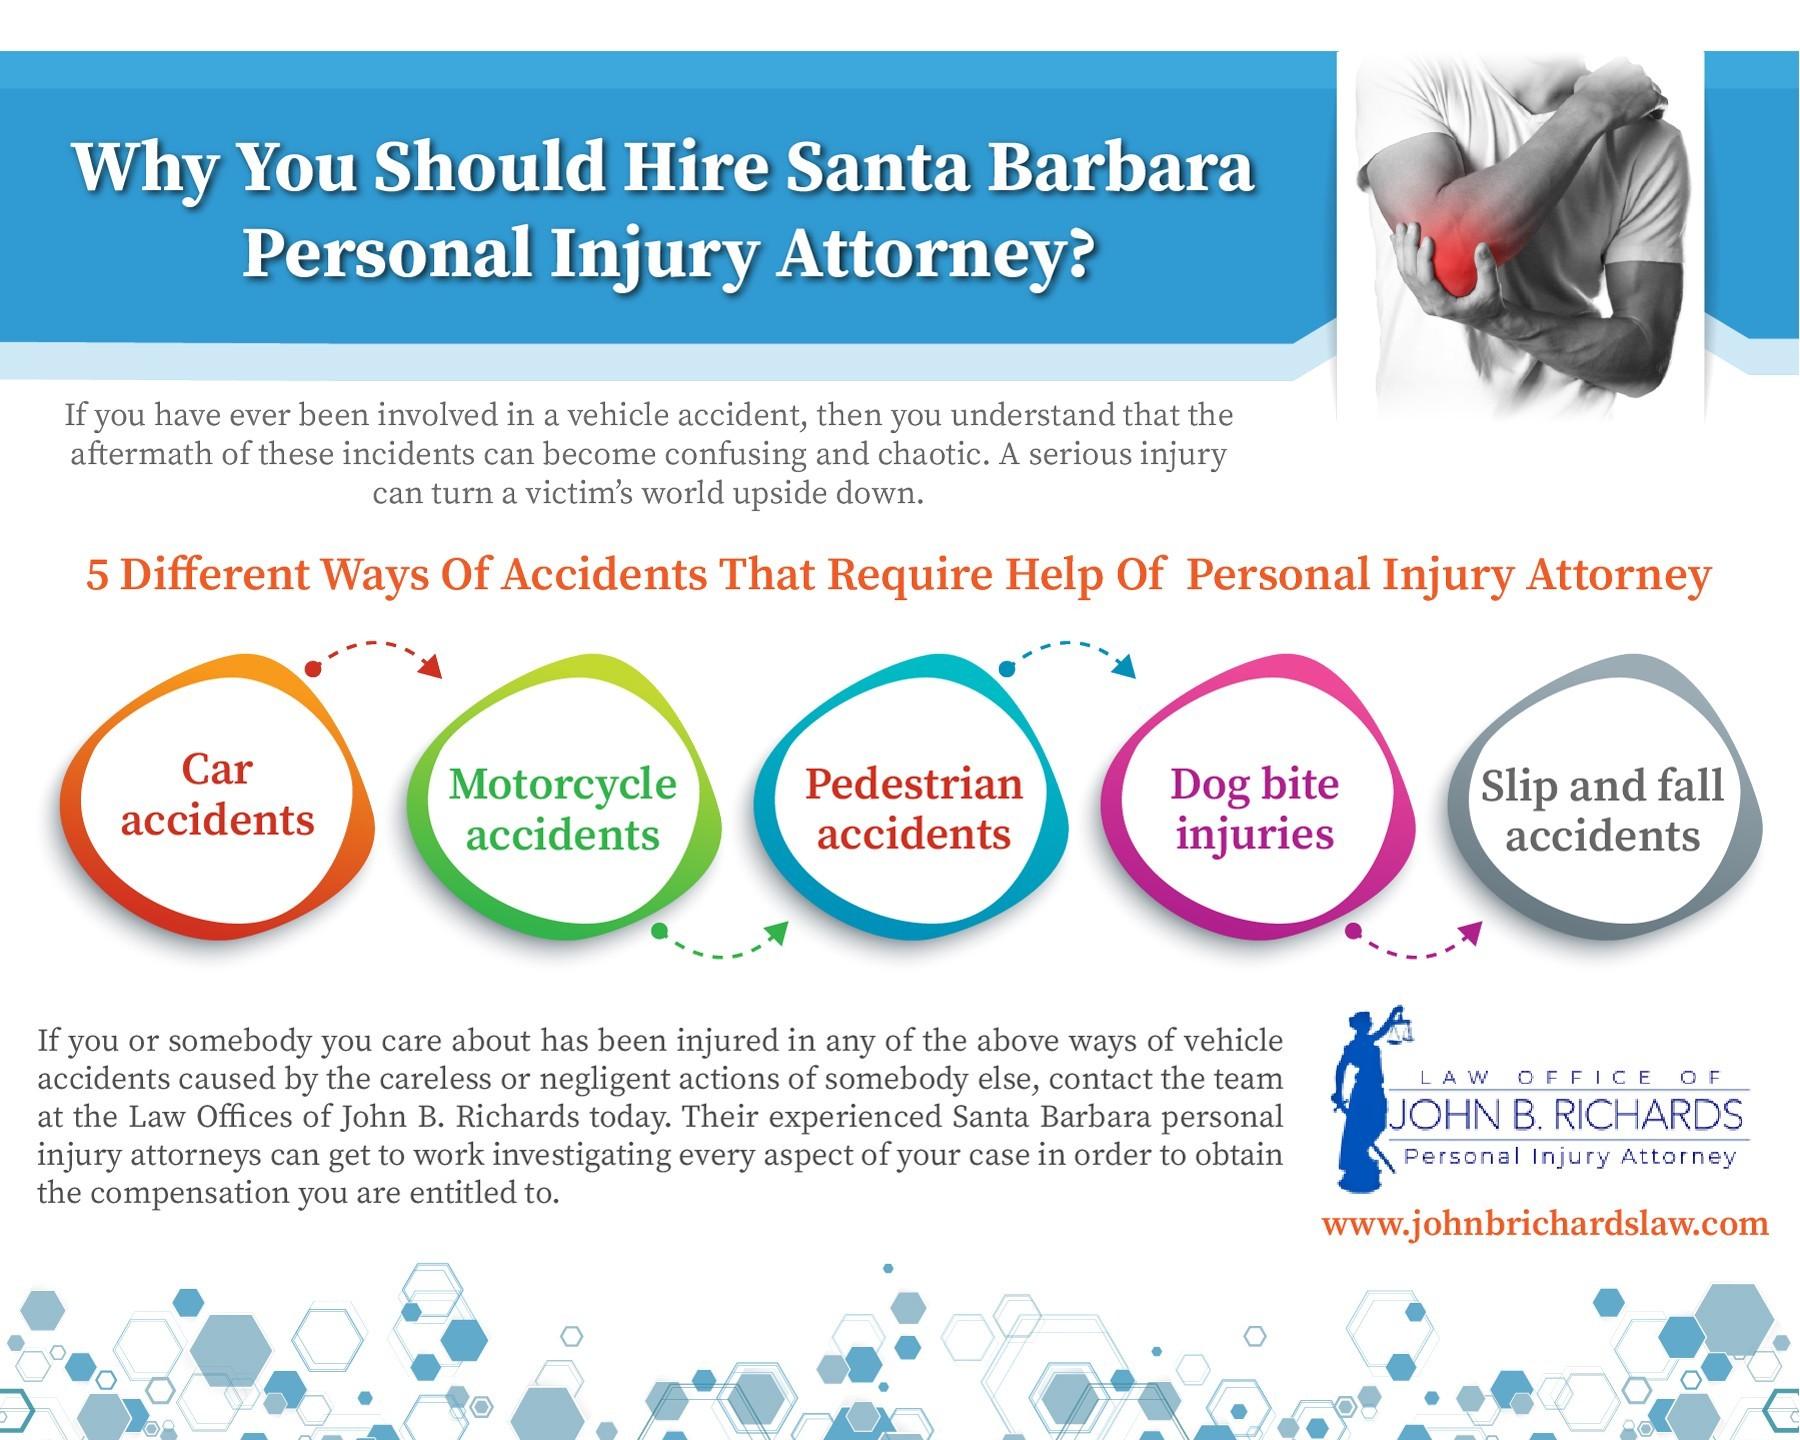 Why You Should Hire Santa Barbara Personal Injury Attorney?